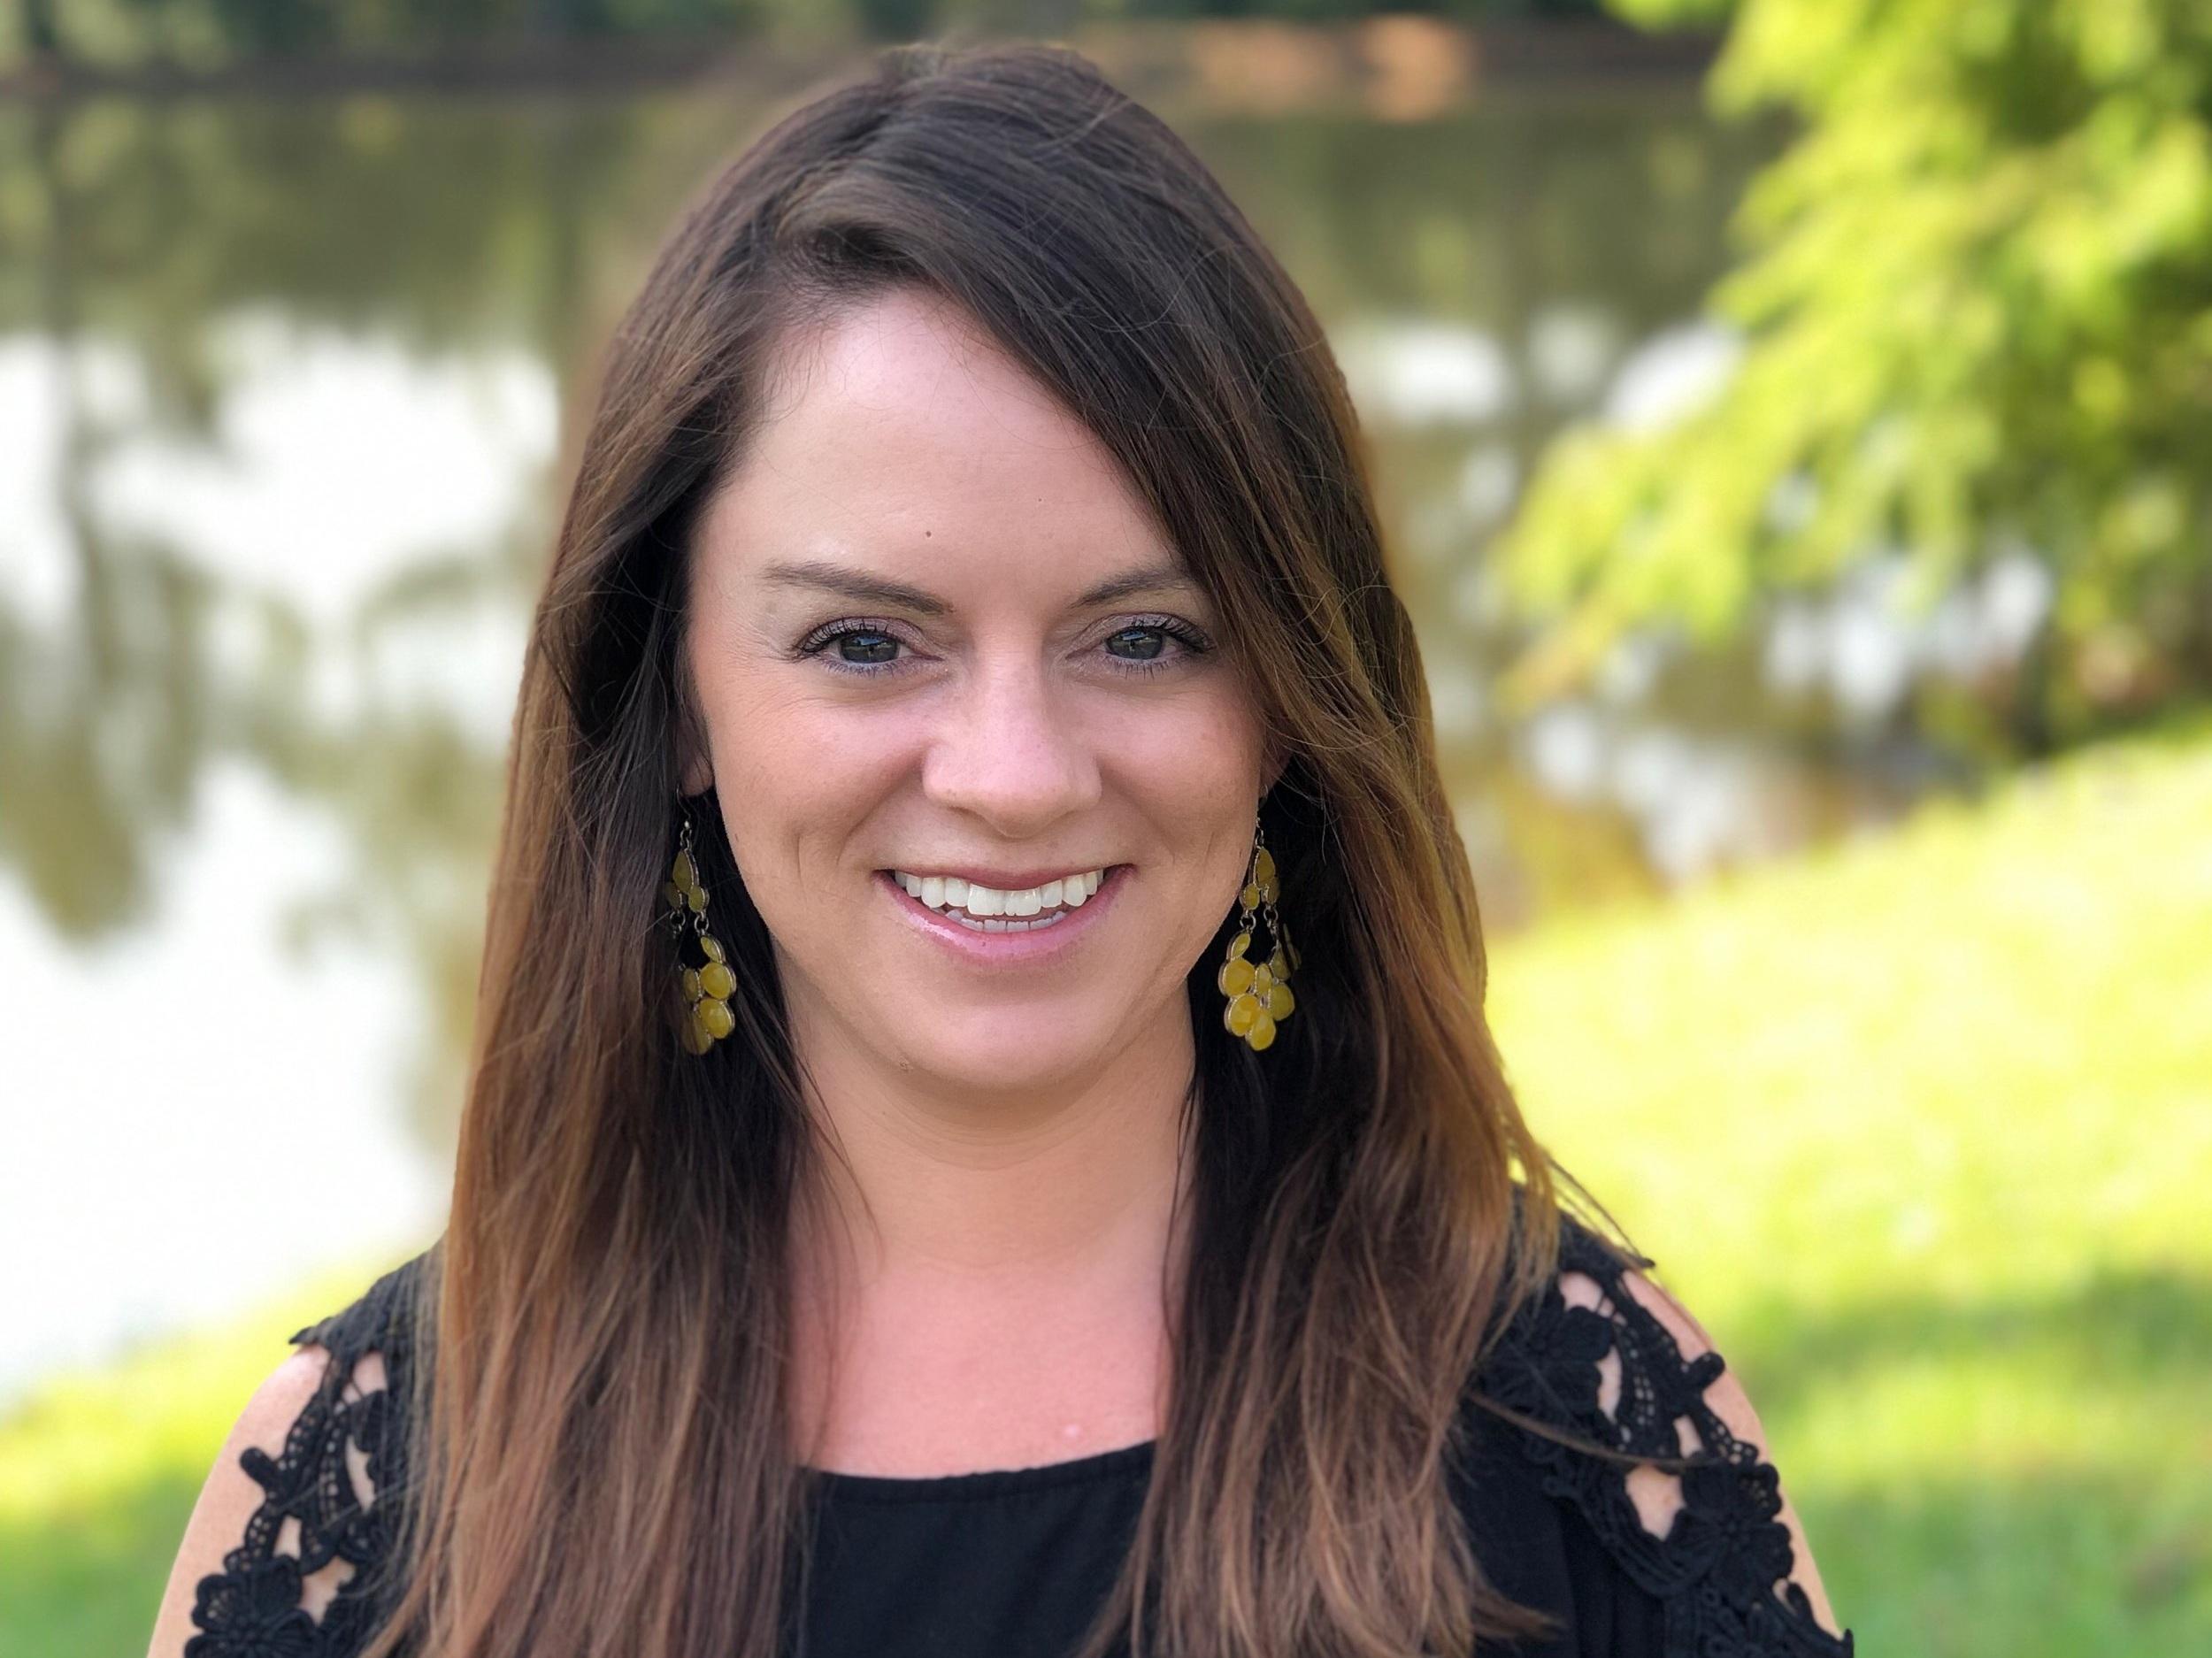 Welcome to the team, Jessica Prescott, Volunteer Supervisor